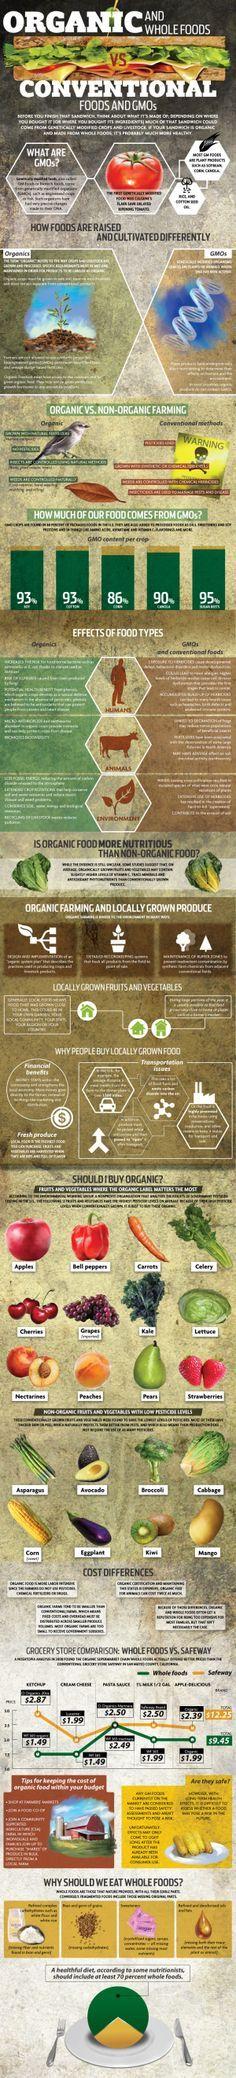 Organic Food vs. Con